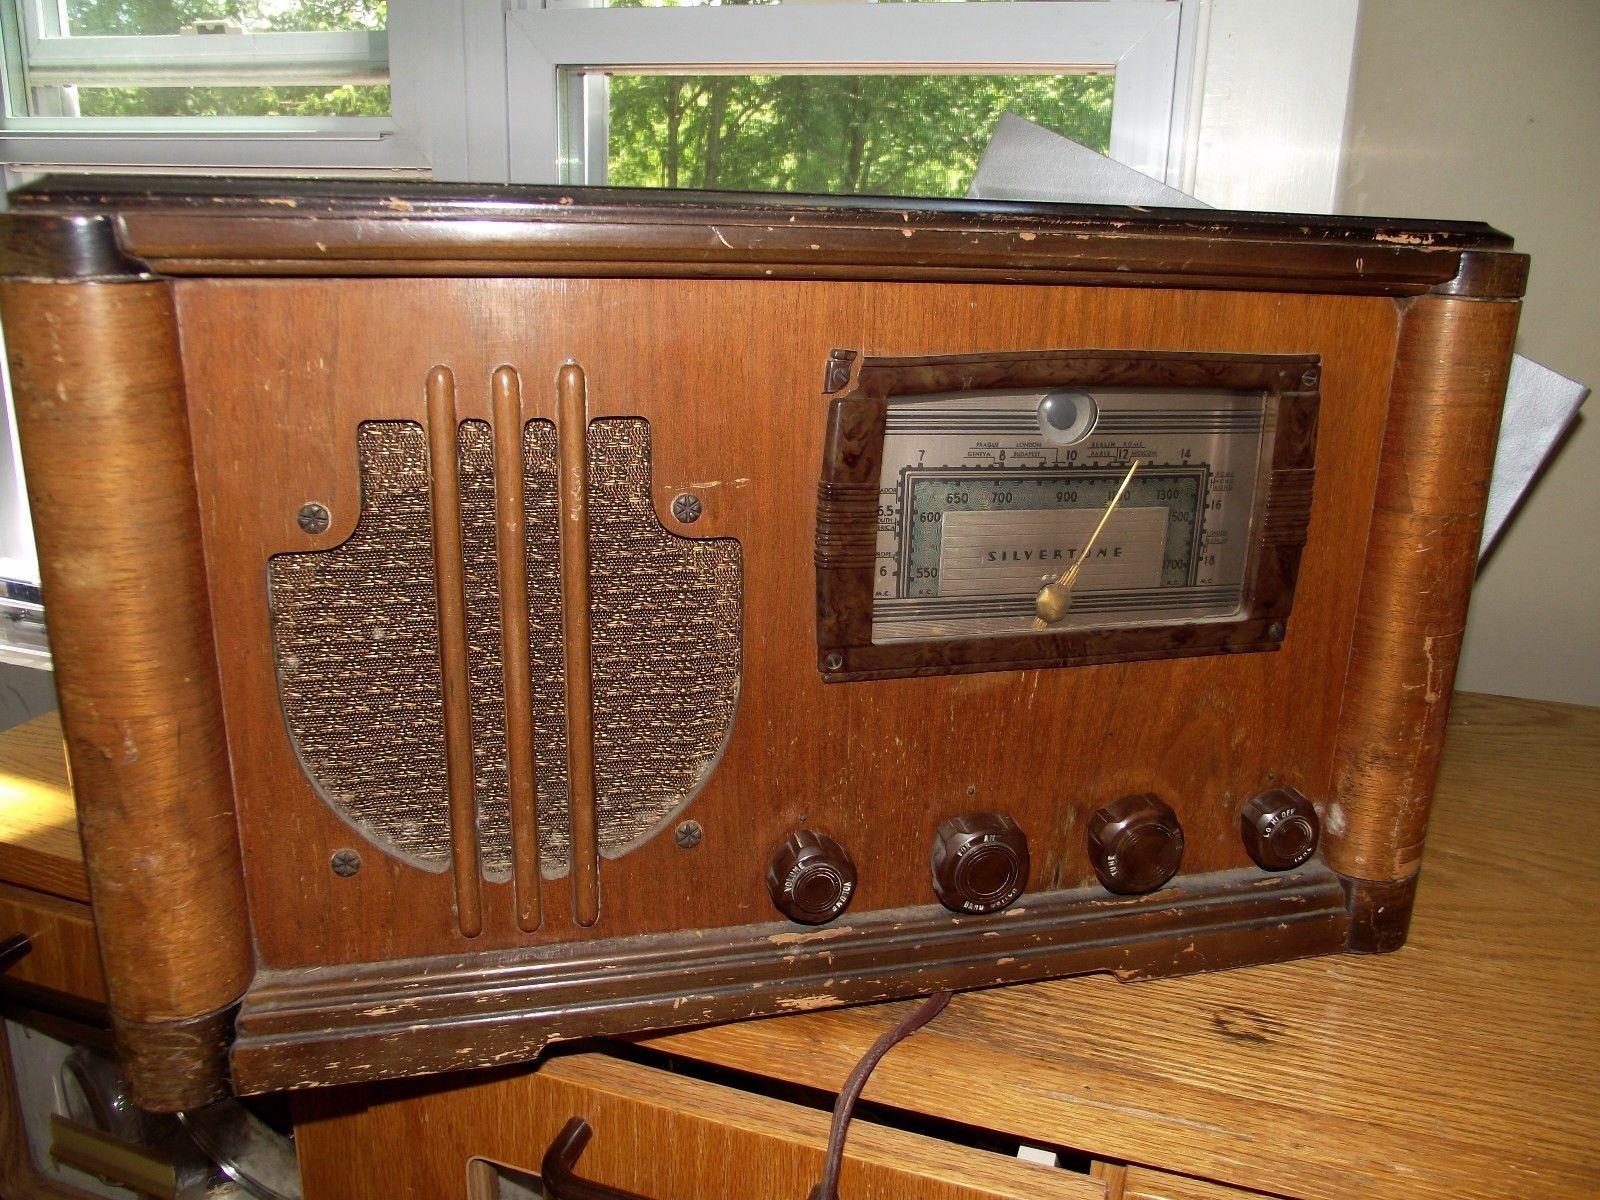 Vintage Silvertone Tube Radio 6075 Sears Amp Roebuck Not